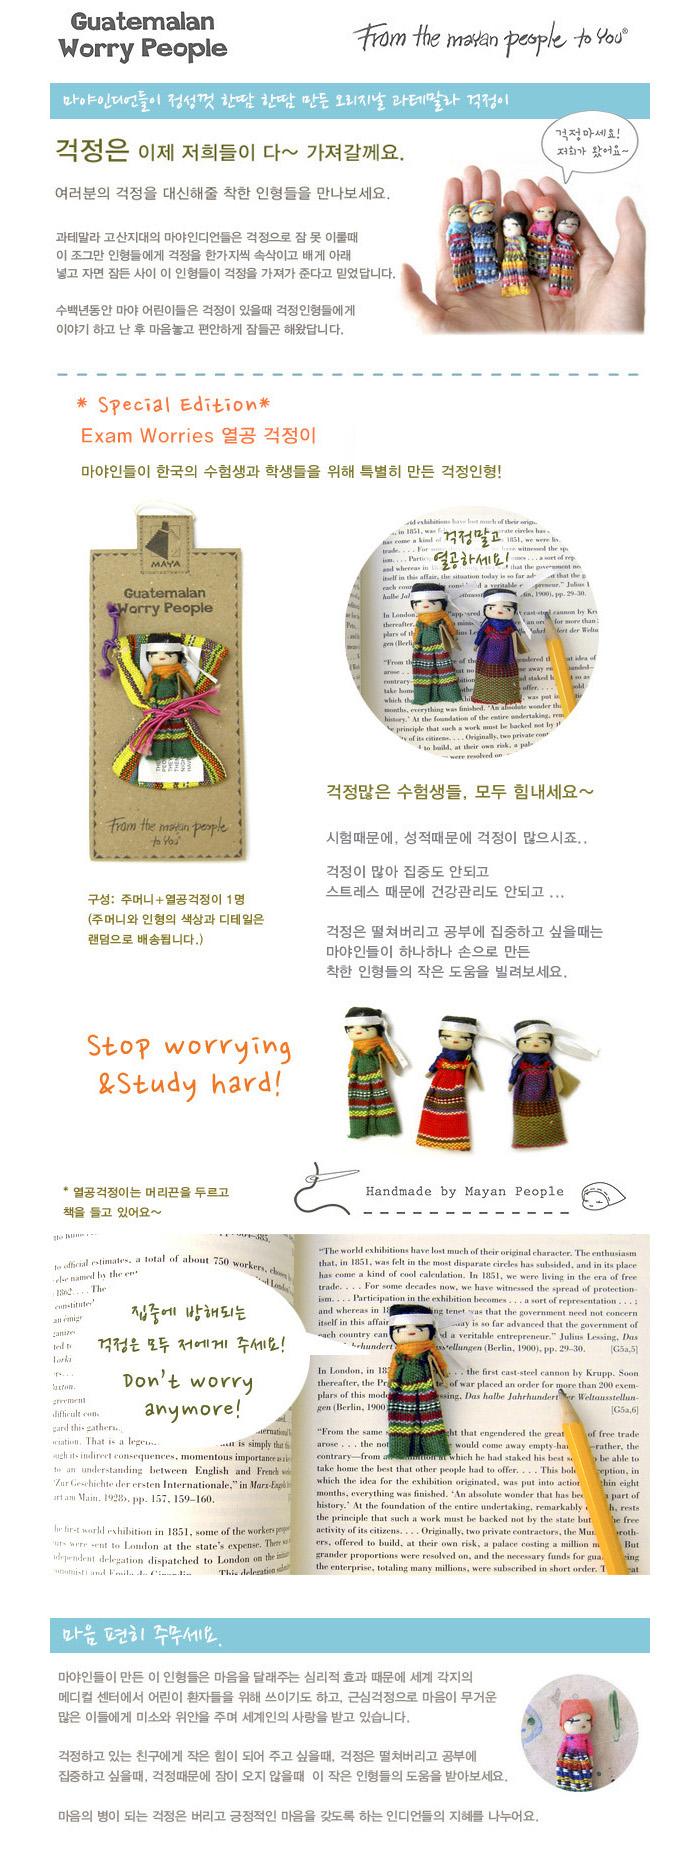 Exam Worries 열공 걱정인형 - 워리피플, 3,370원, 걱정인형, 워리피플